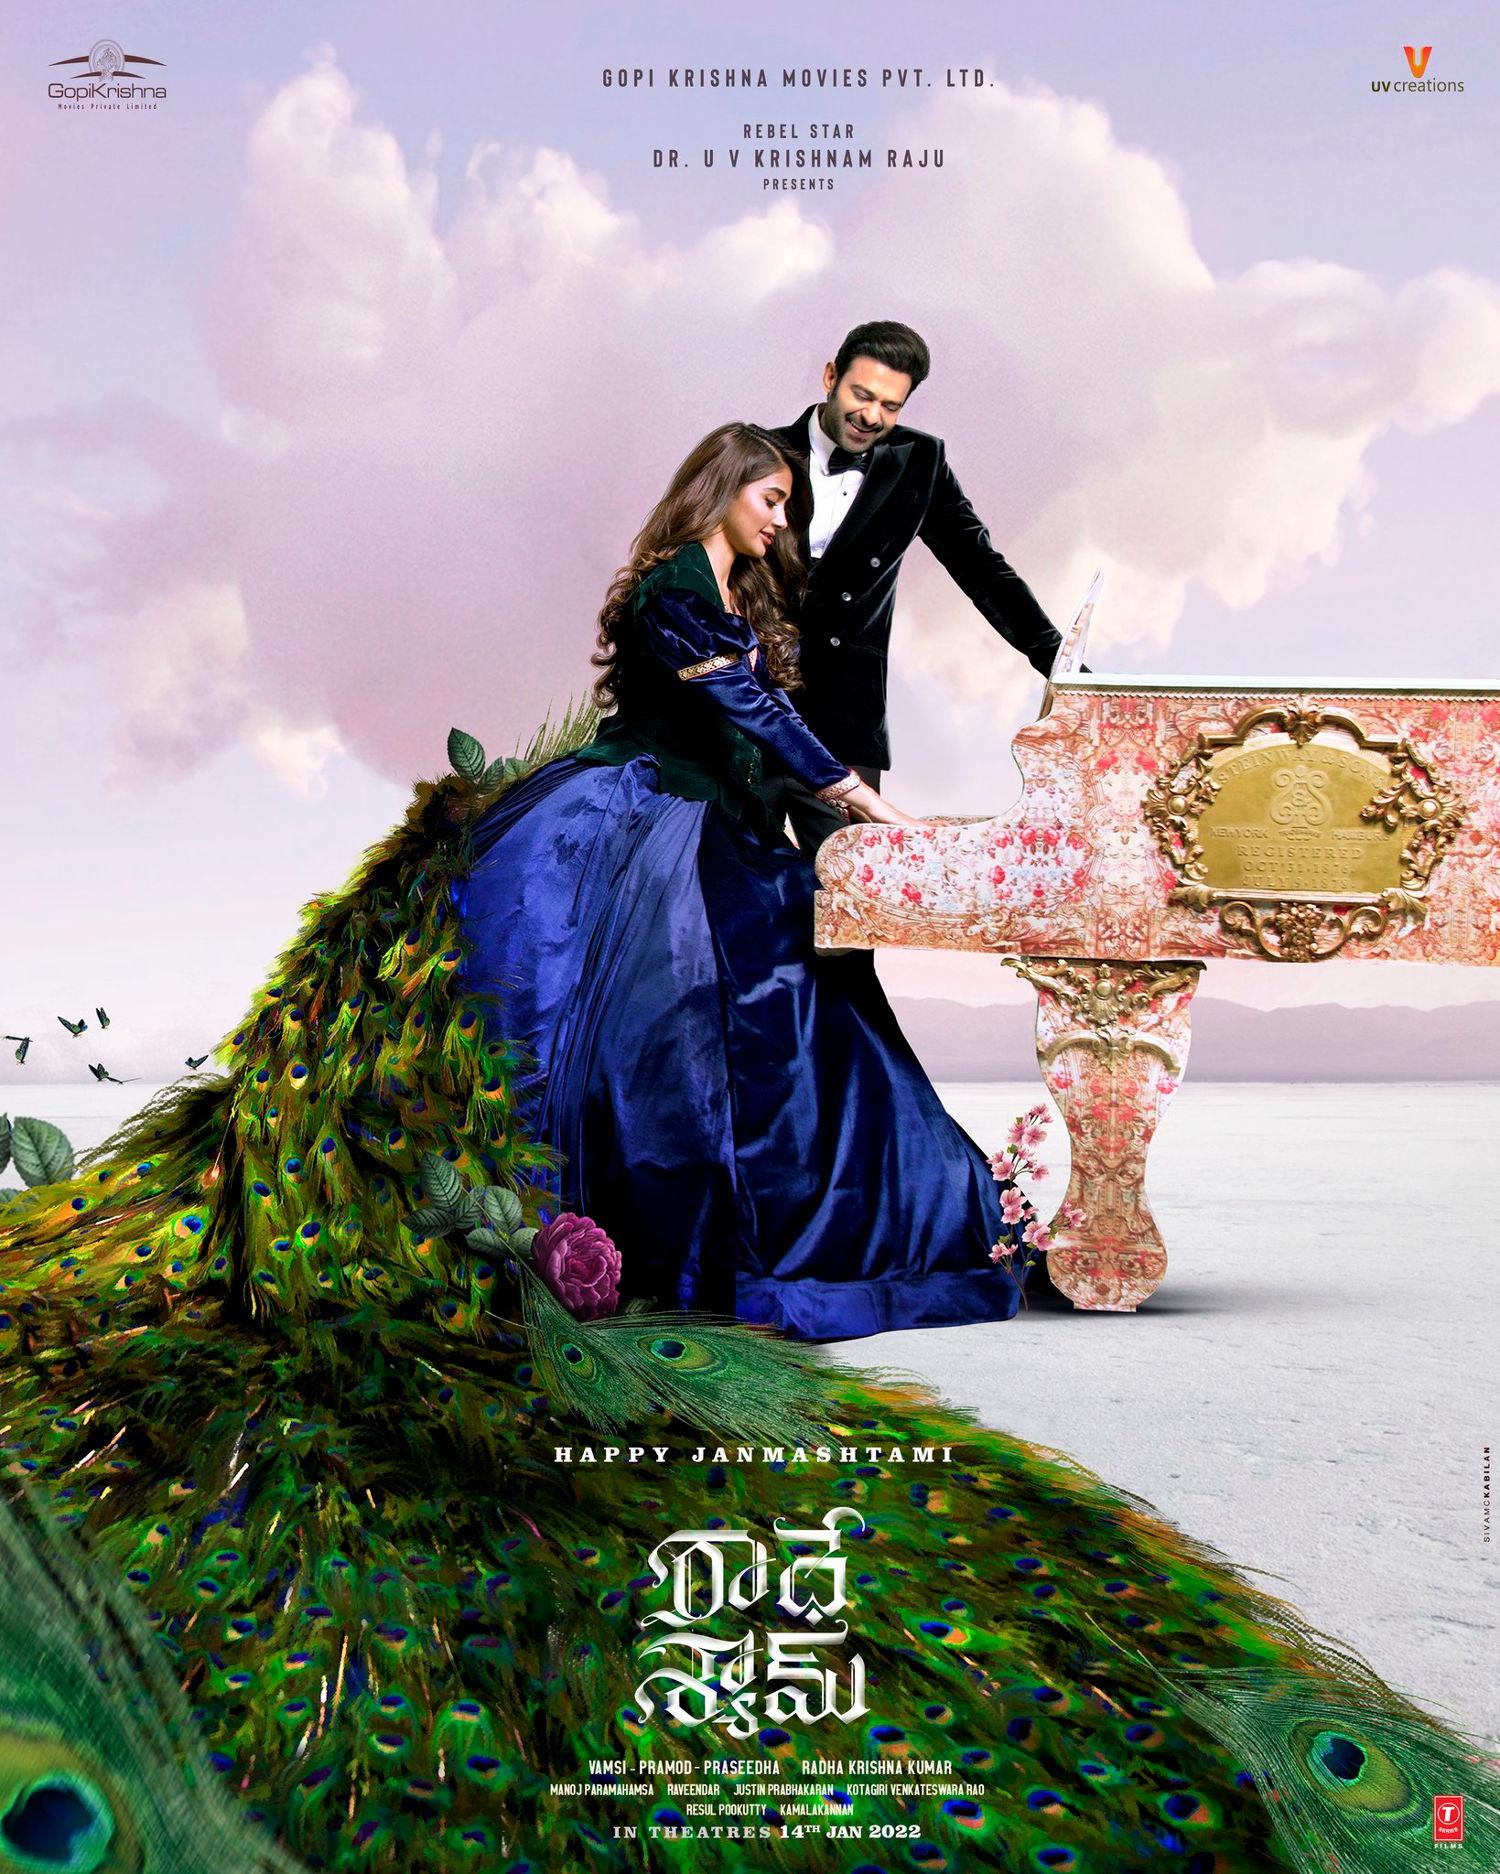 Radhe Shyam Movie Janamashtami Wishes Poster HD